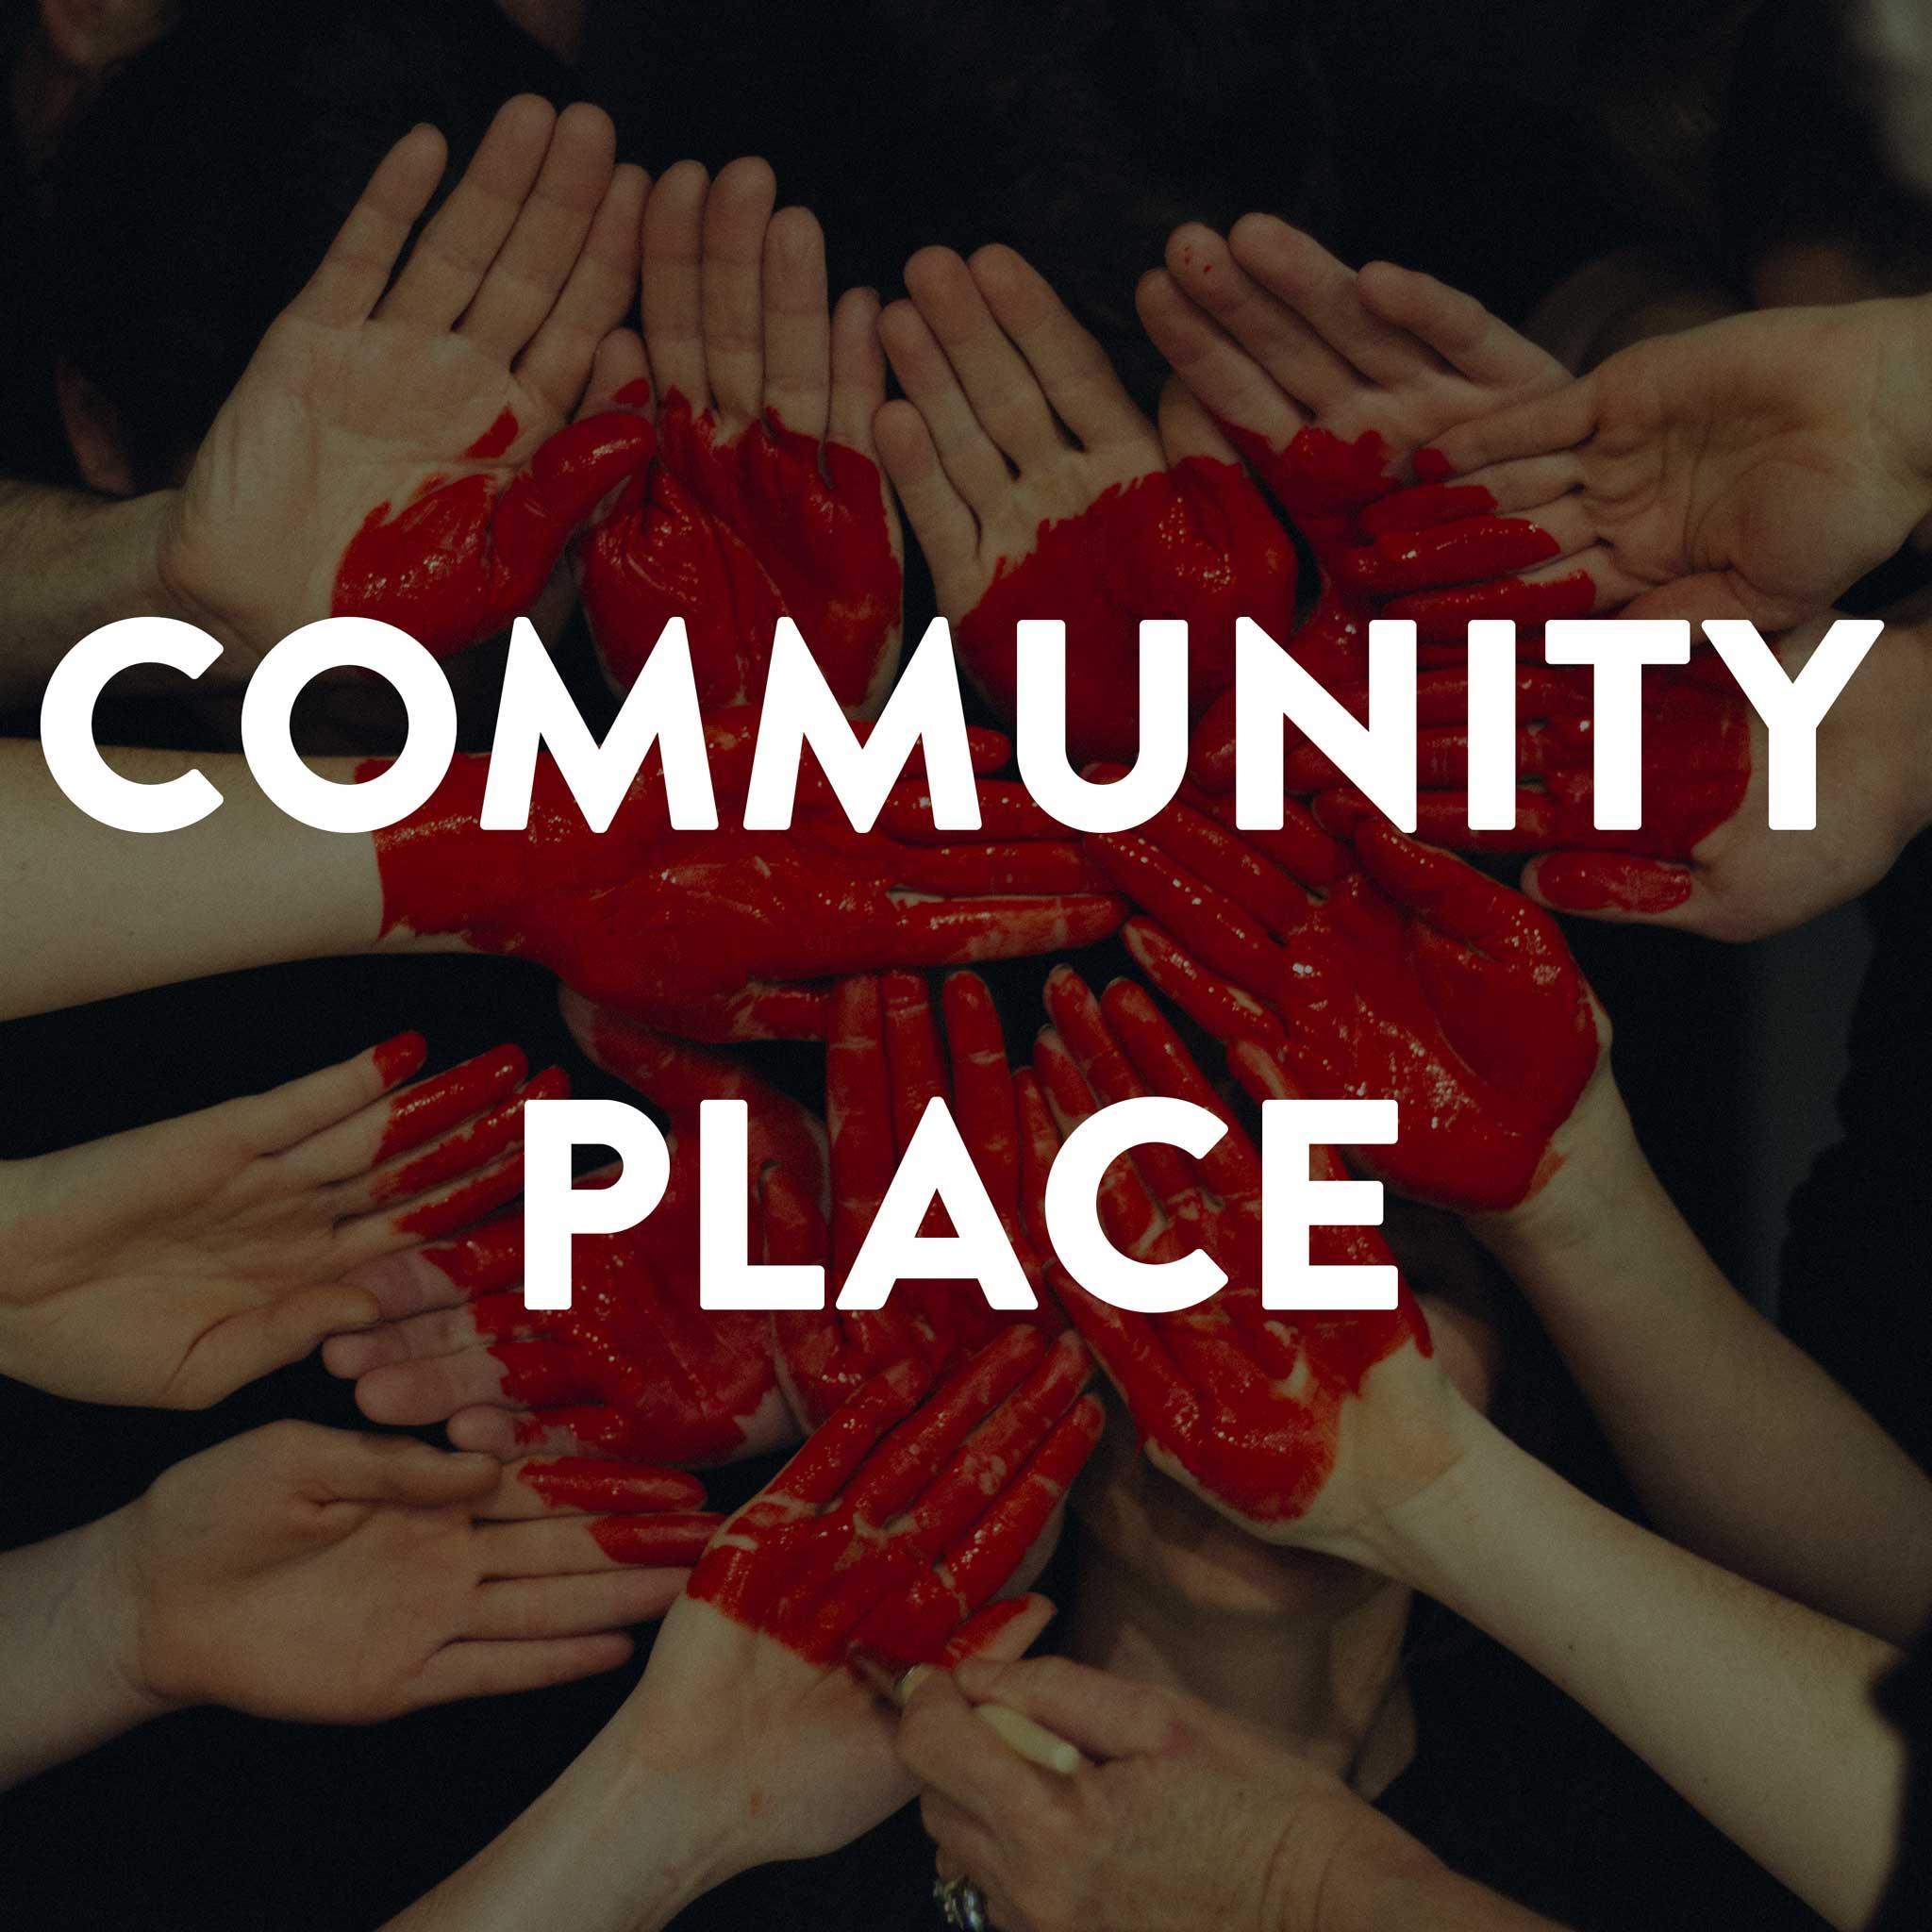 communityPlace.jpg